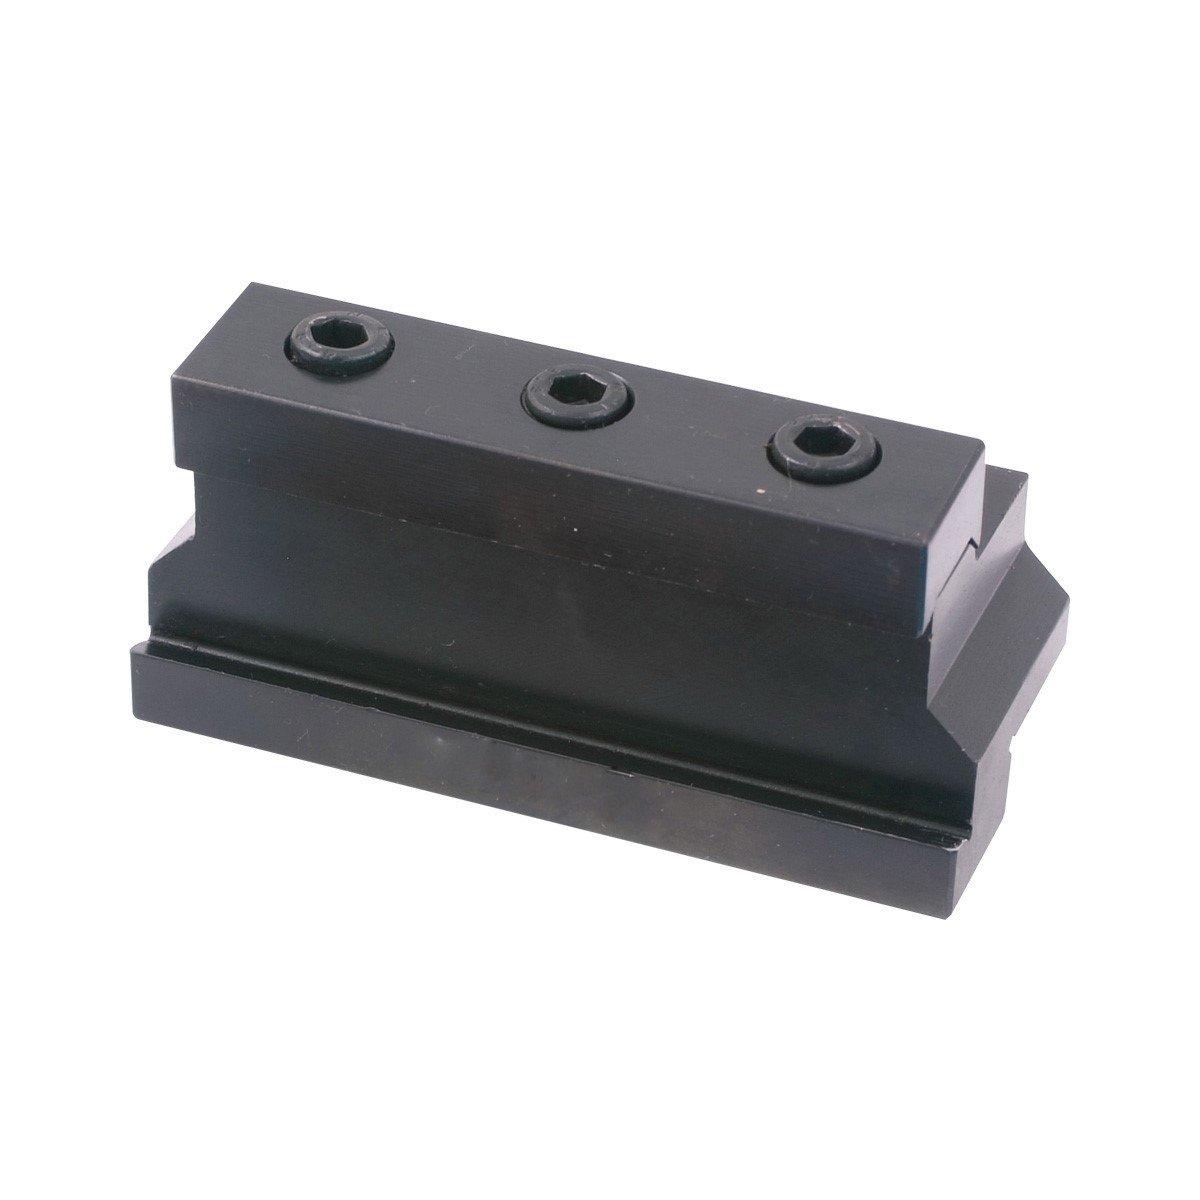 HHIP 3900 5354 Carbide Indexable Cut Off Individual Tool Block 3.40 Length x 1.3 Width x 1.50 Height